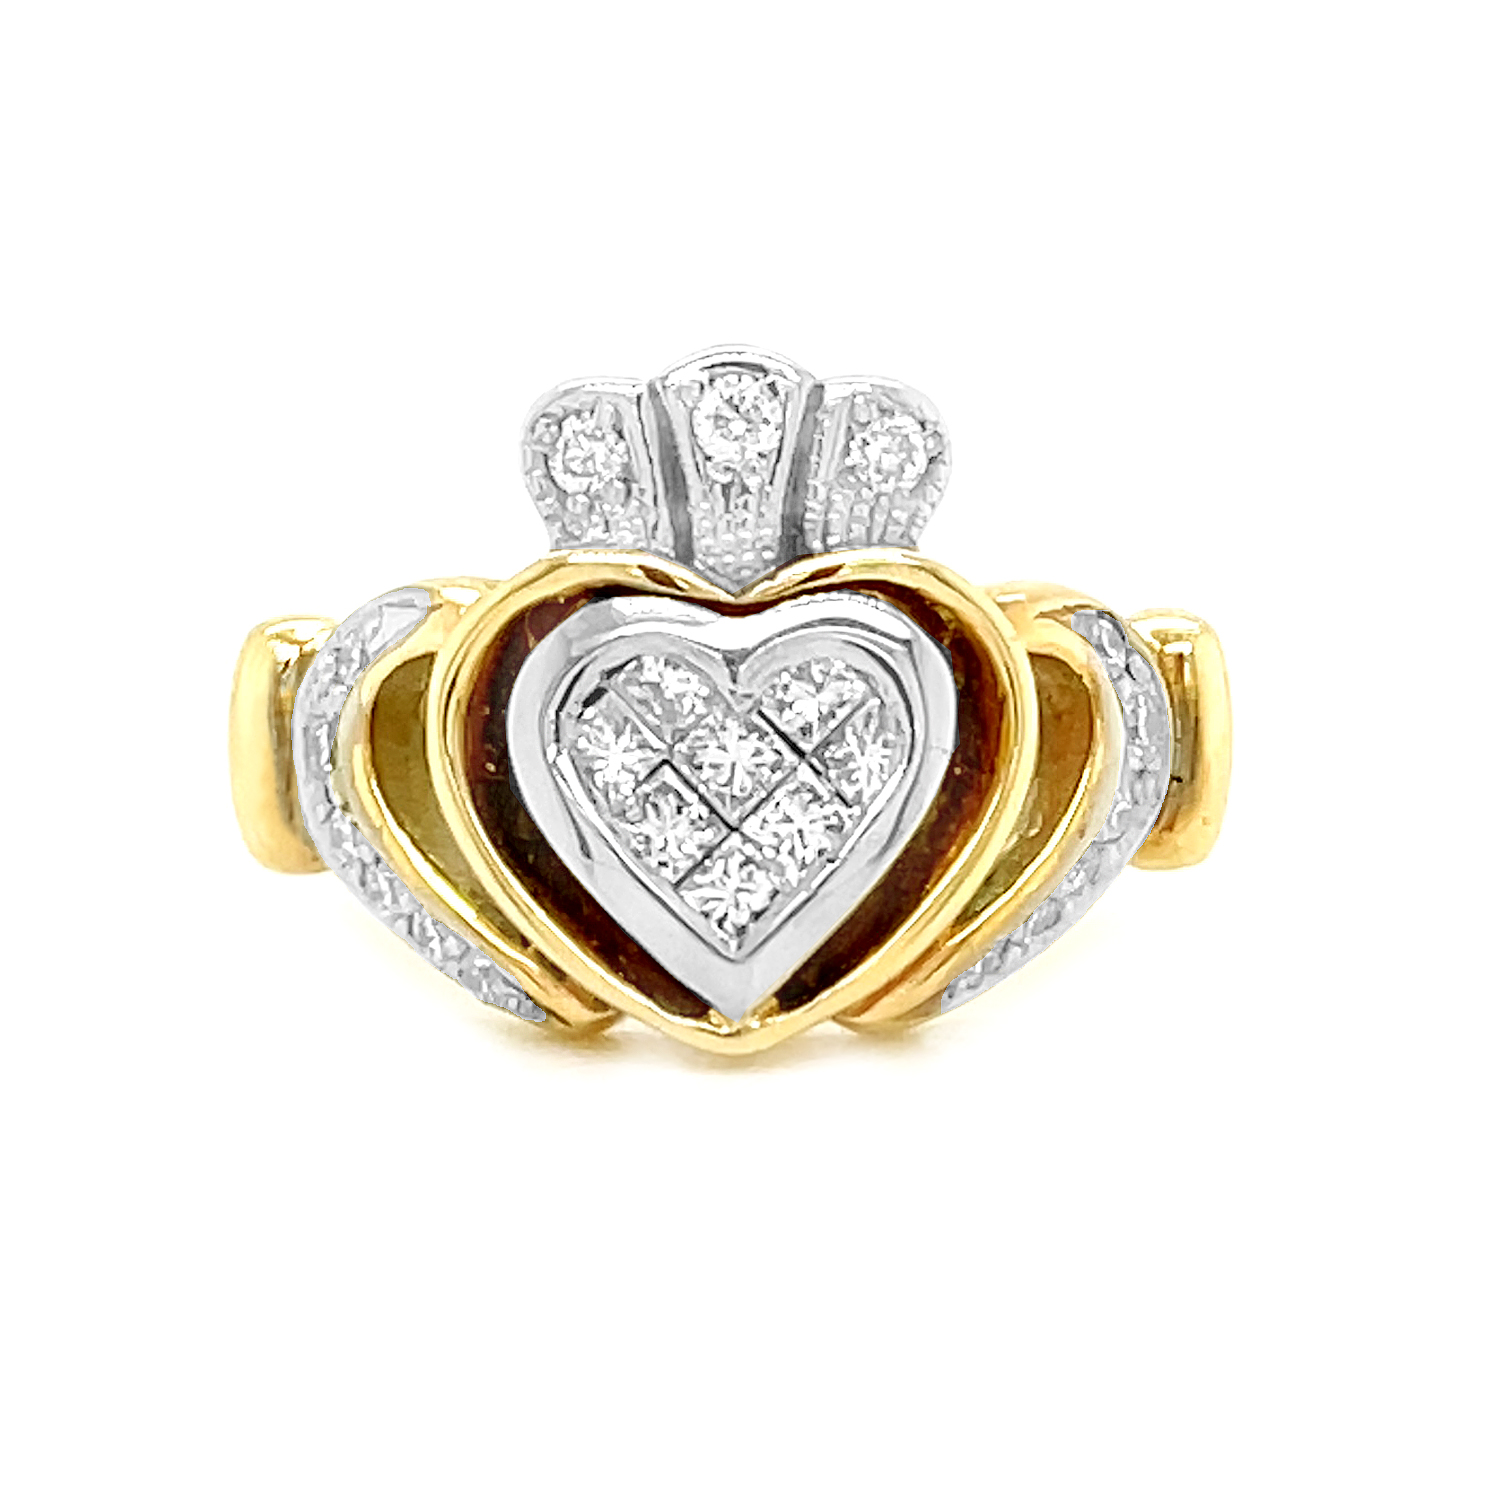 Claddagh Ring With Diamond